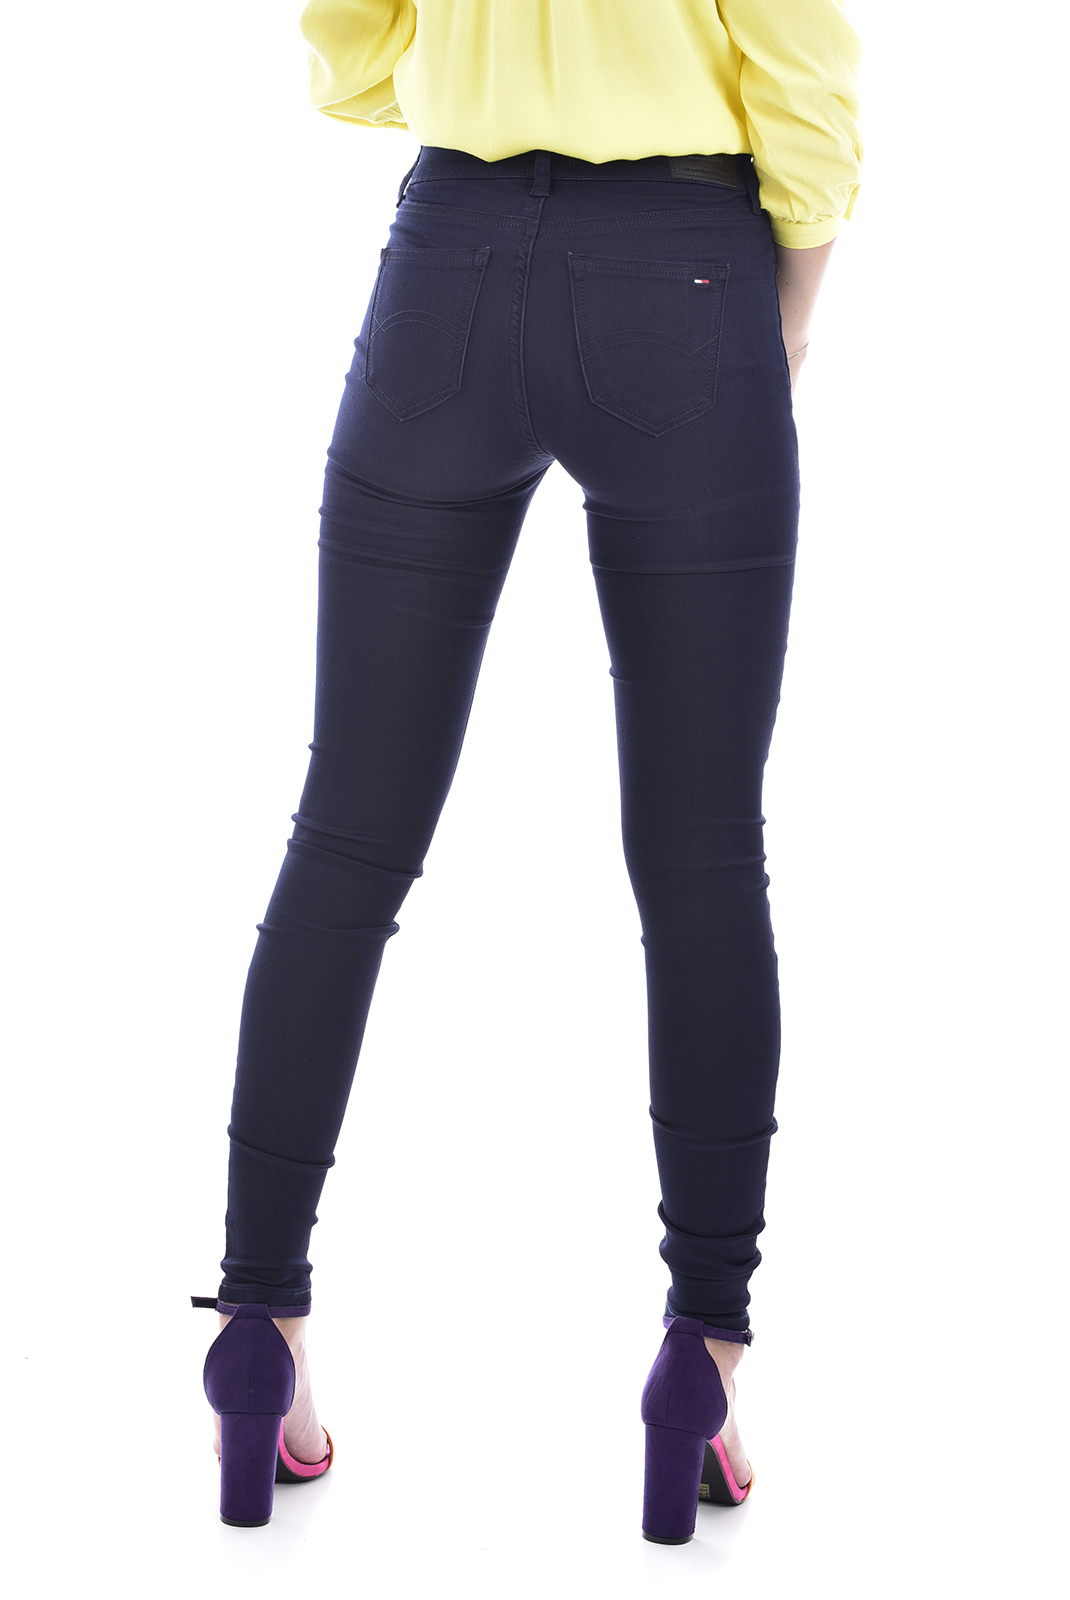 Jeans slim  Tommy Jeans DW0DW04413980 980 BLUE DENIM